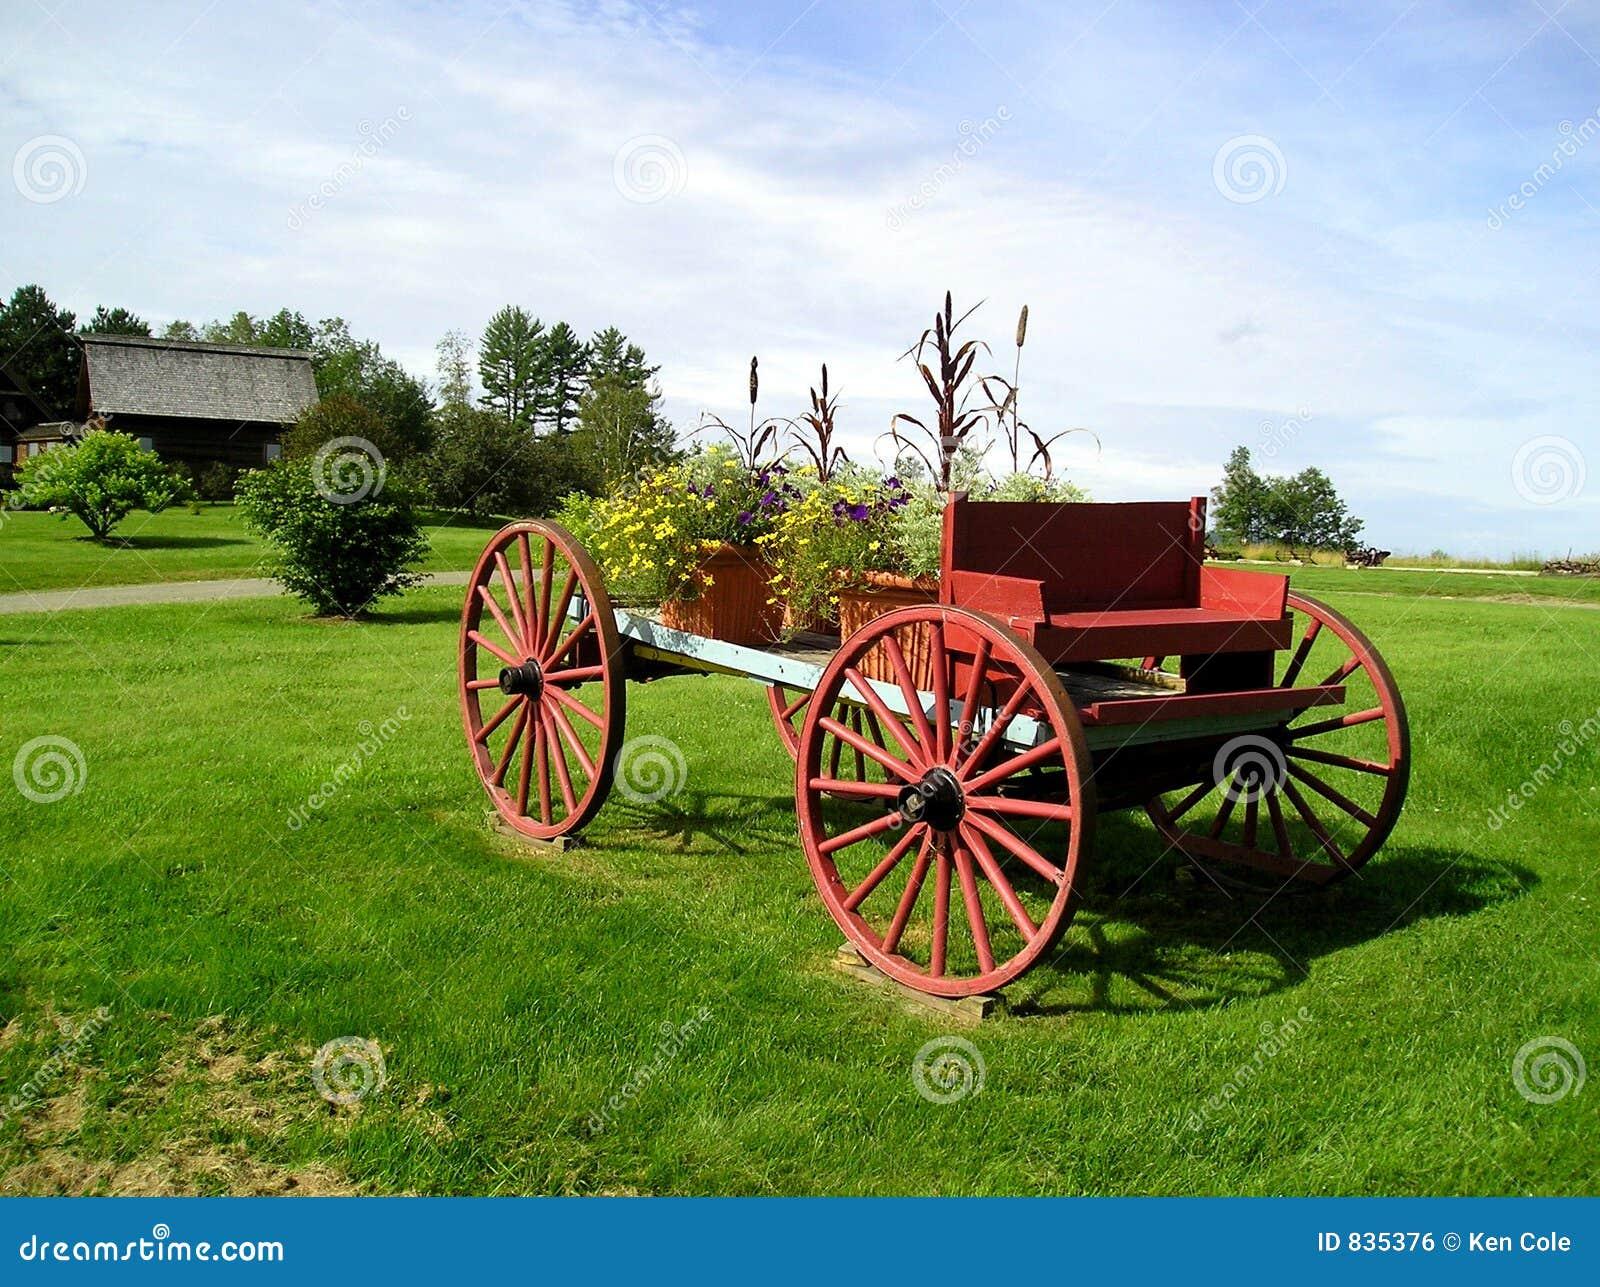 Decorative Flower Wagon